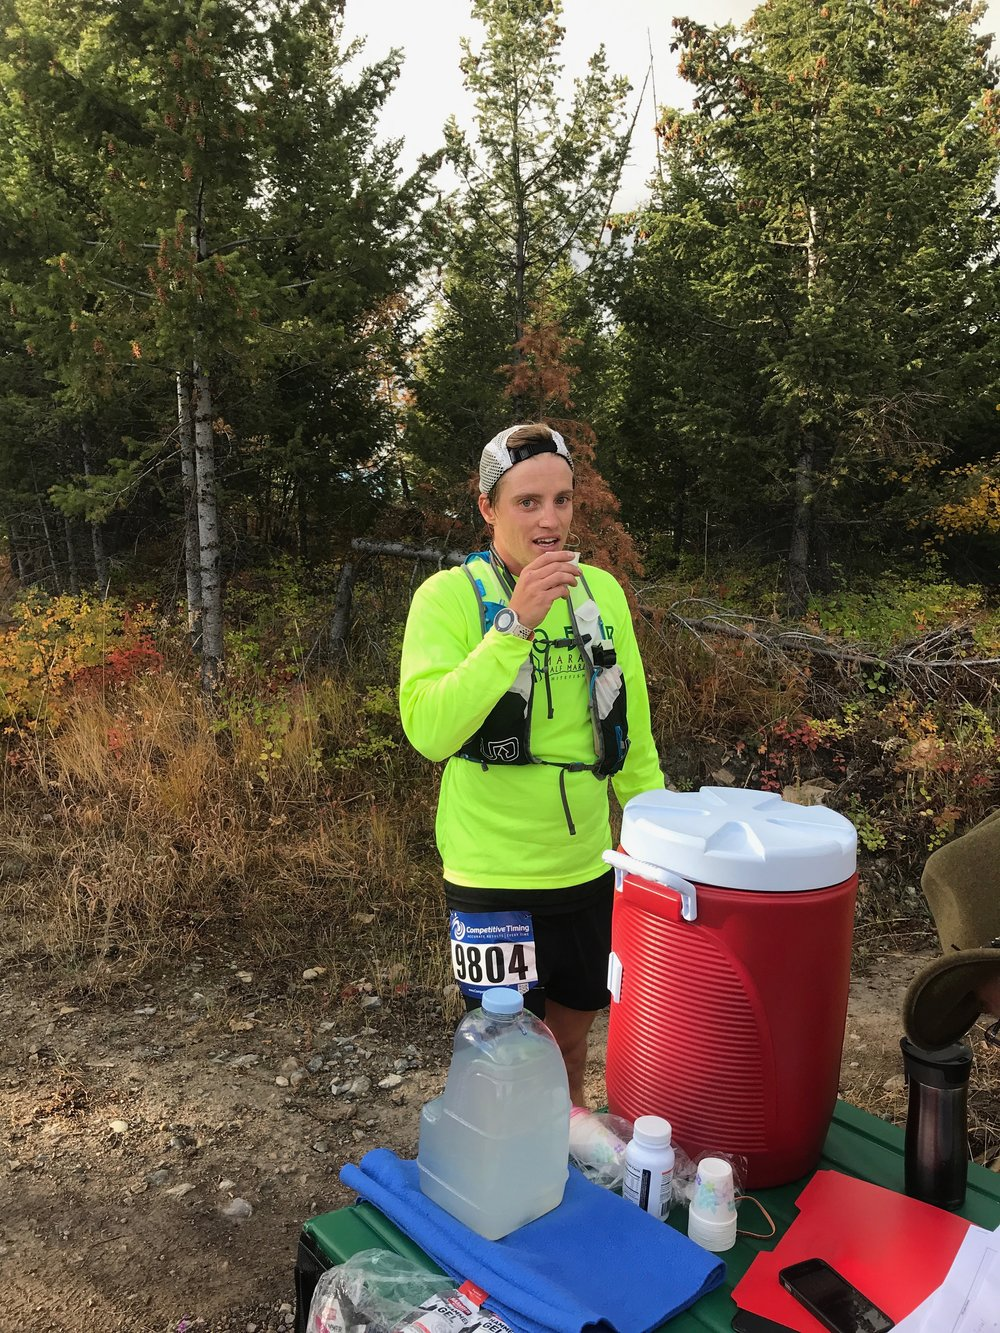 foys to blacktail trails trail marathon ftbtIMG_1747.JPG